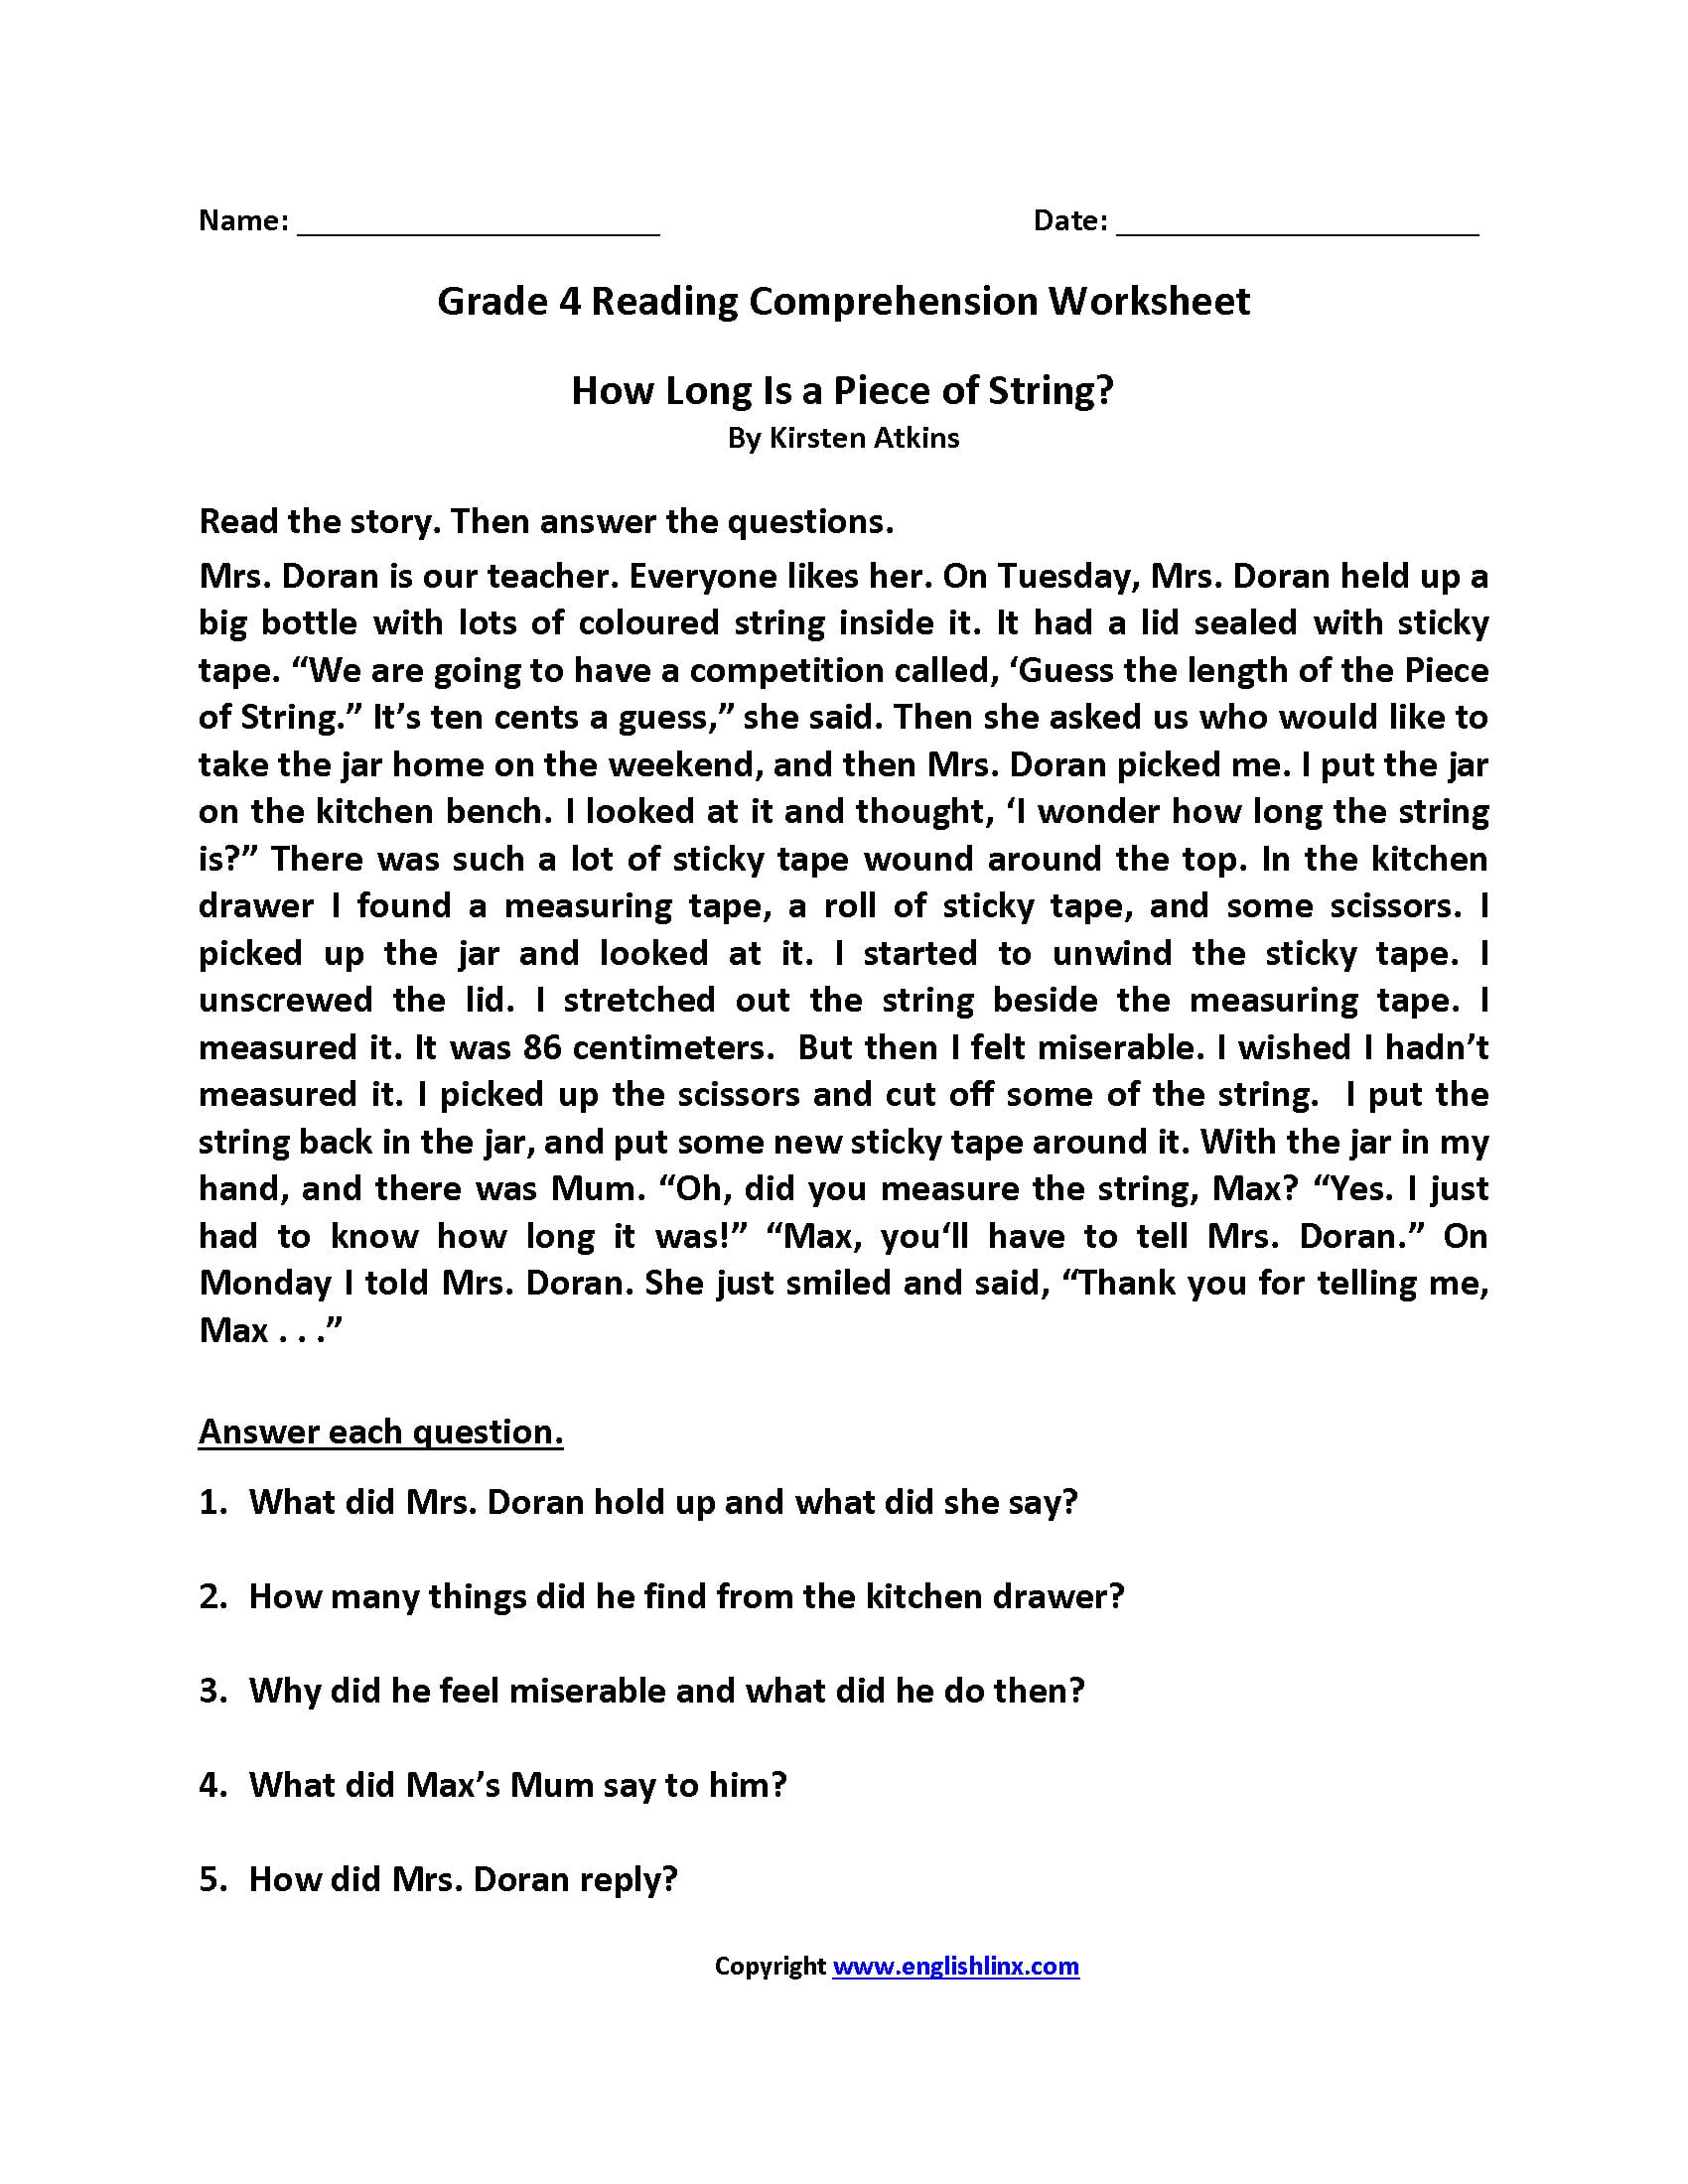 Reading Comprehension Worksheets 4Th Grade — db excel.com